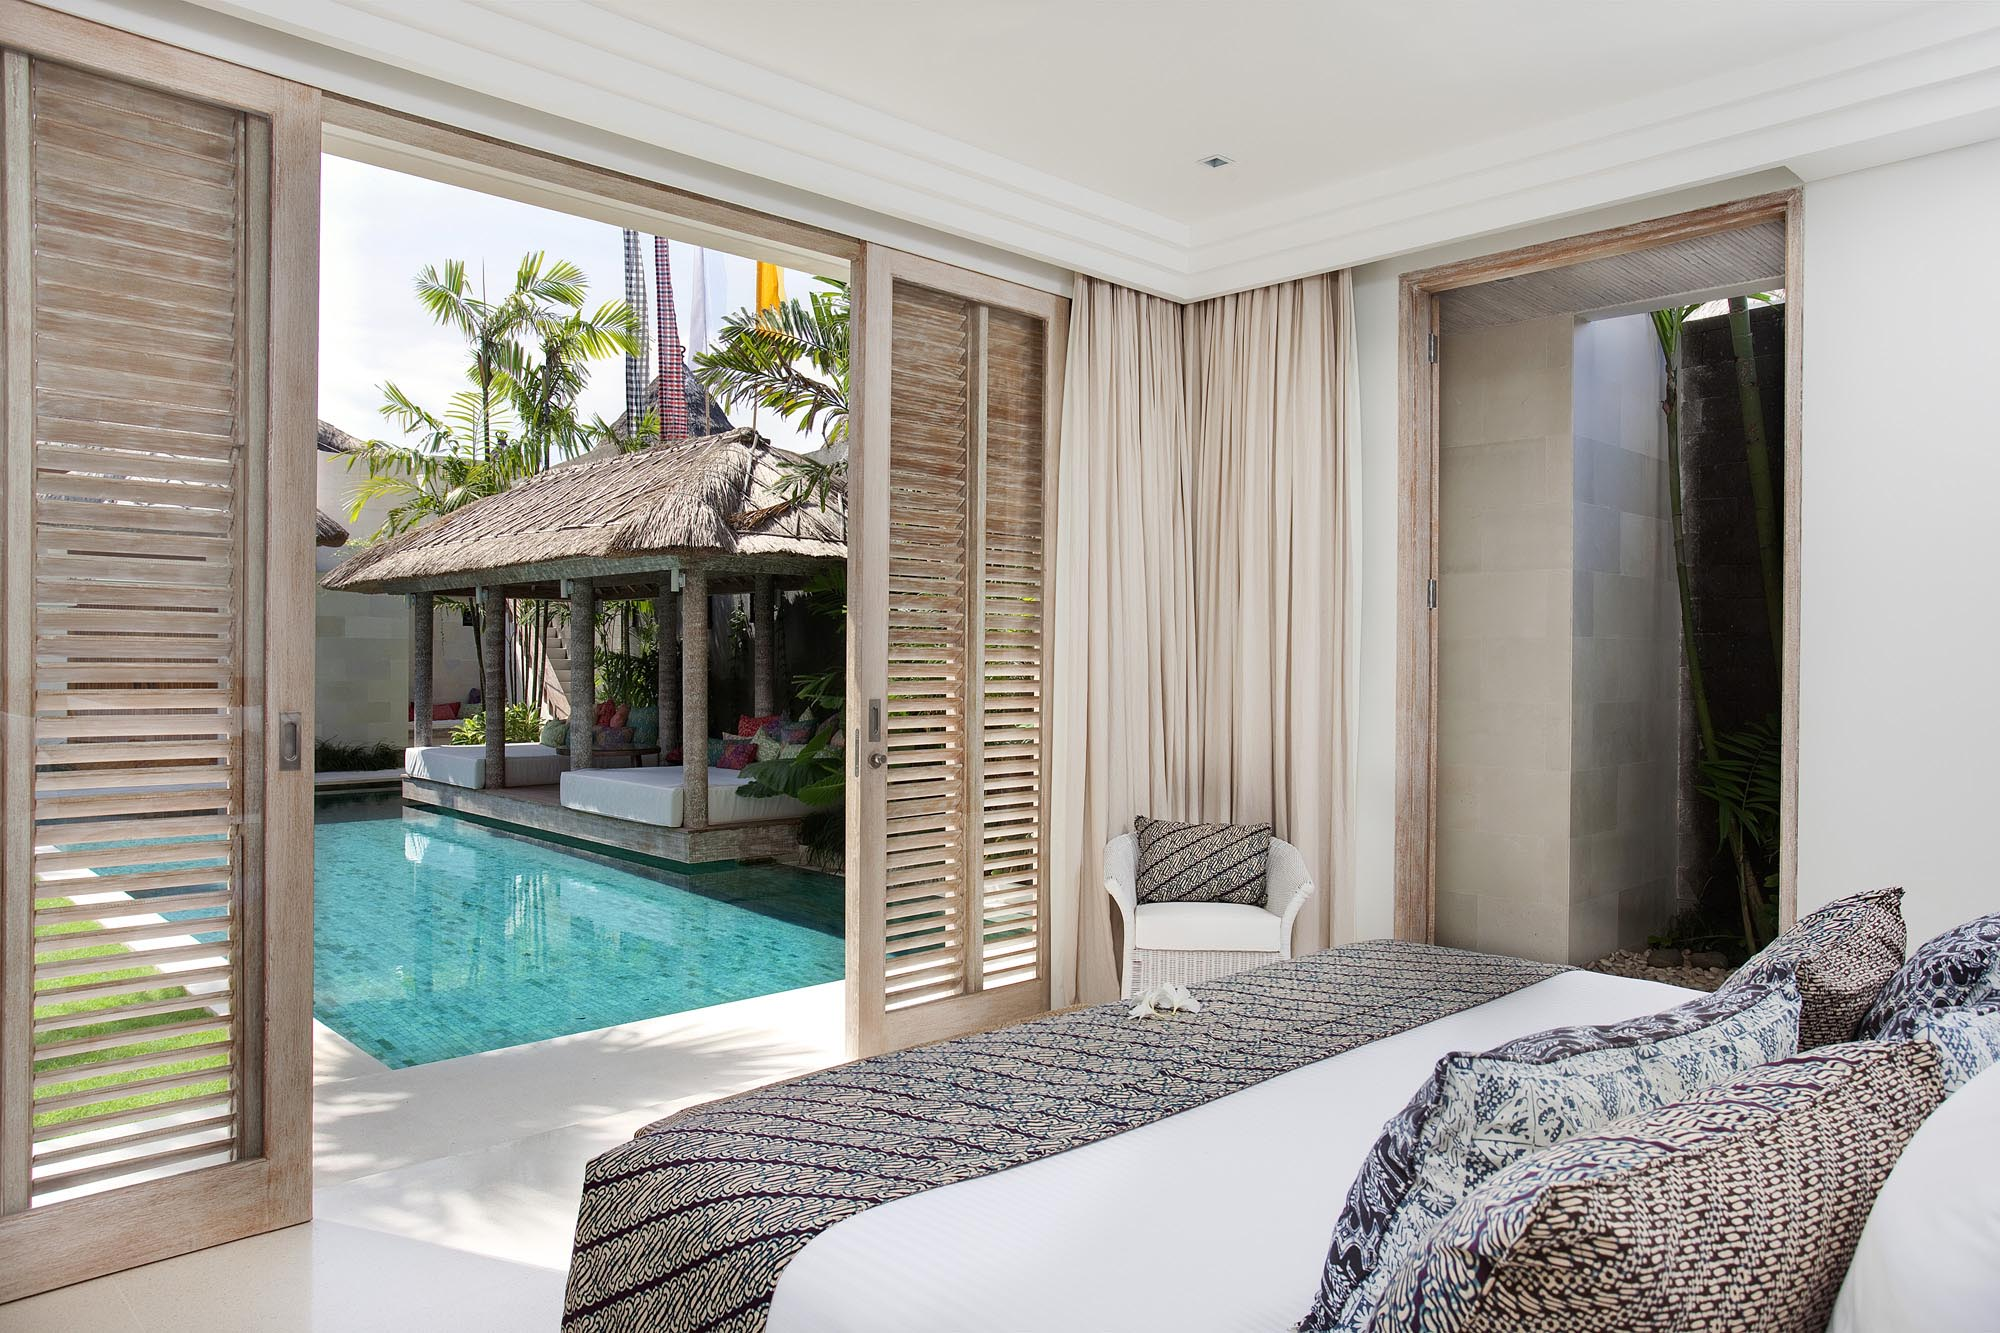 Villa Adasa 3 Bedrooms Seminyak Bali Ultimate Bali Villas